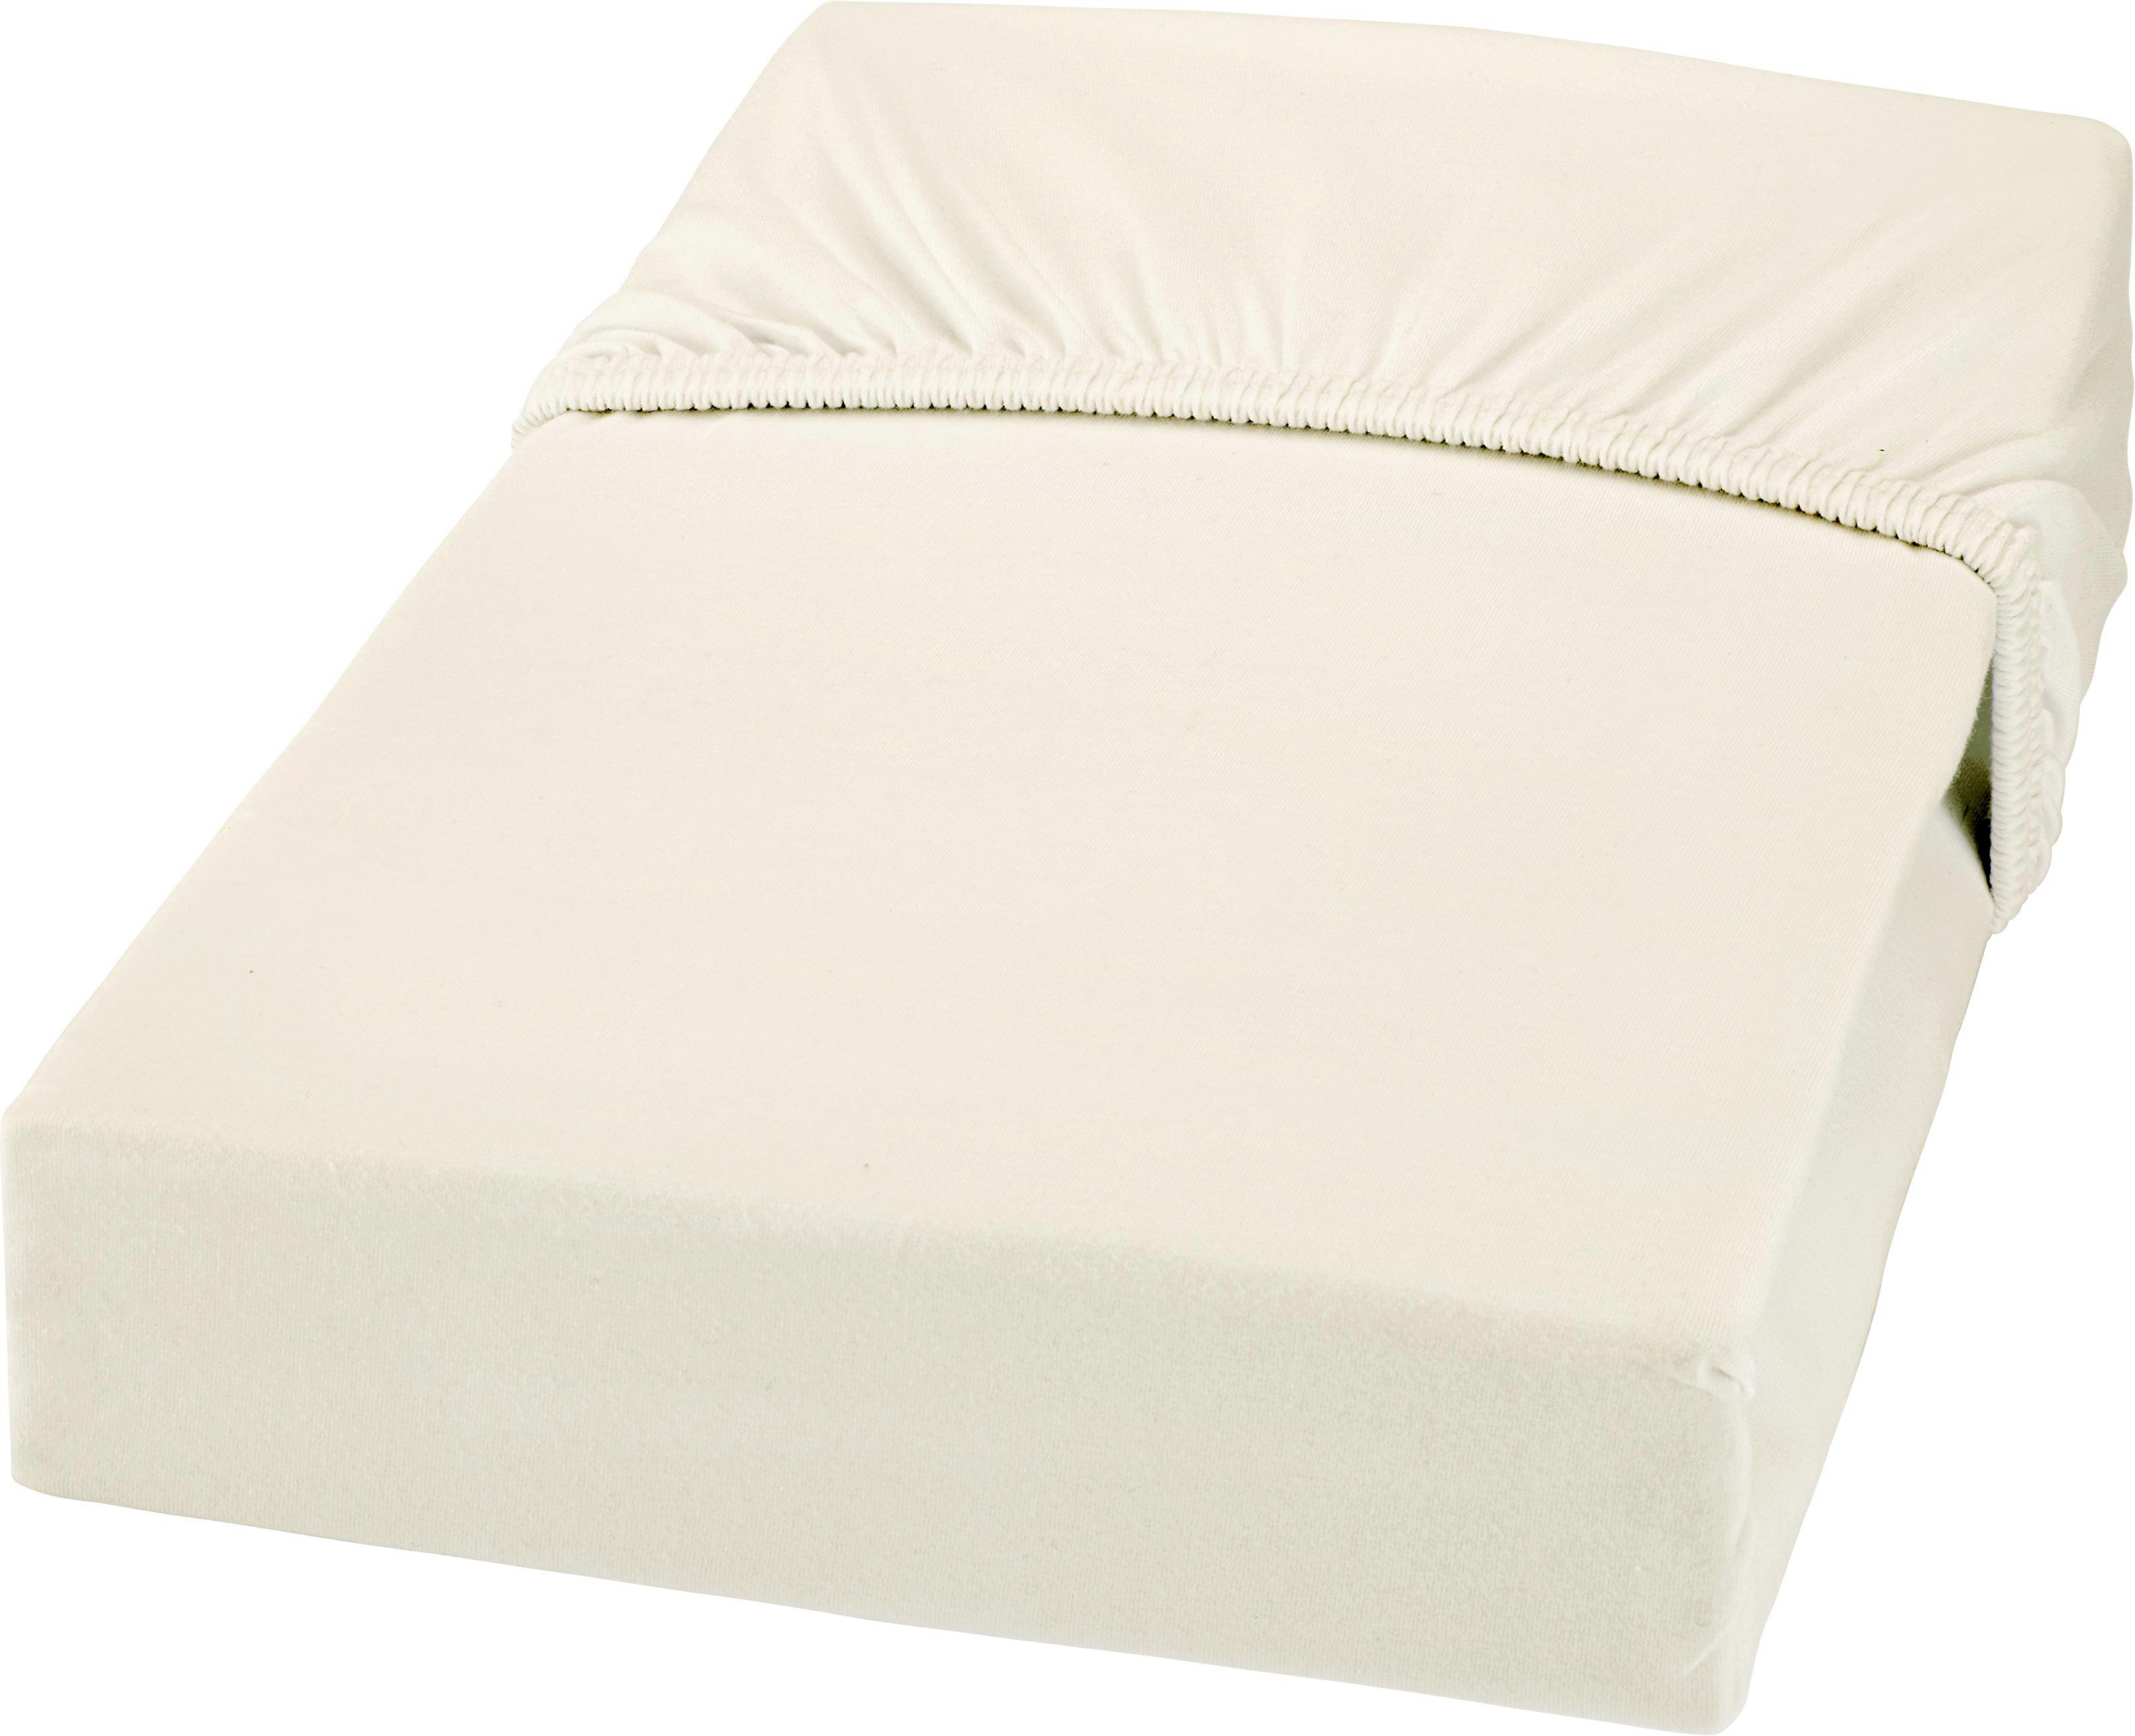 Spannbetttuch Jersey 180x200 cm - Naturfarben, MODERN, Textil (180/200cm) - MÖMAX modern living